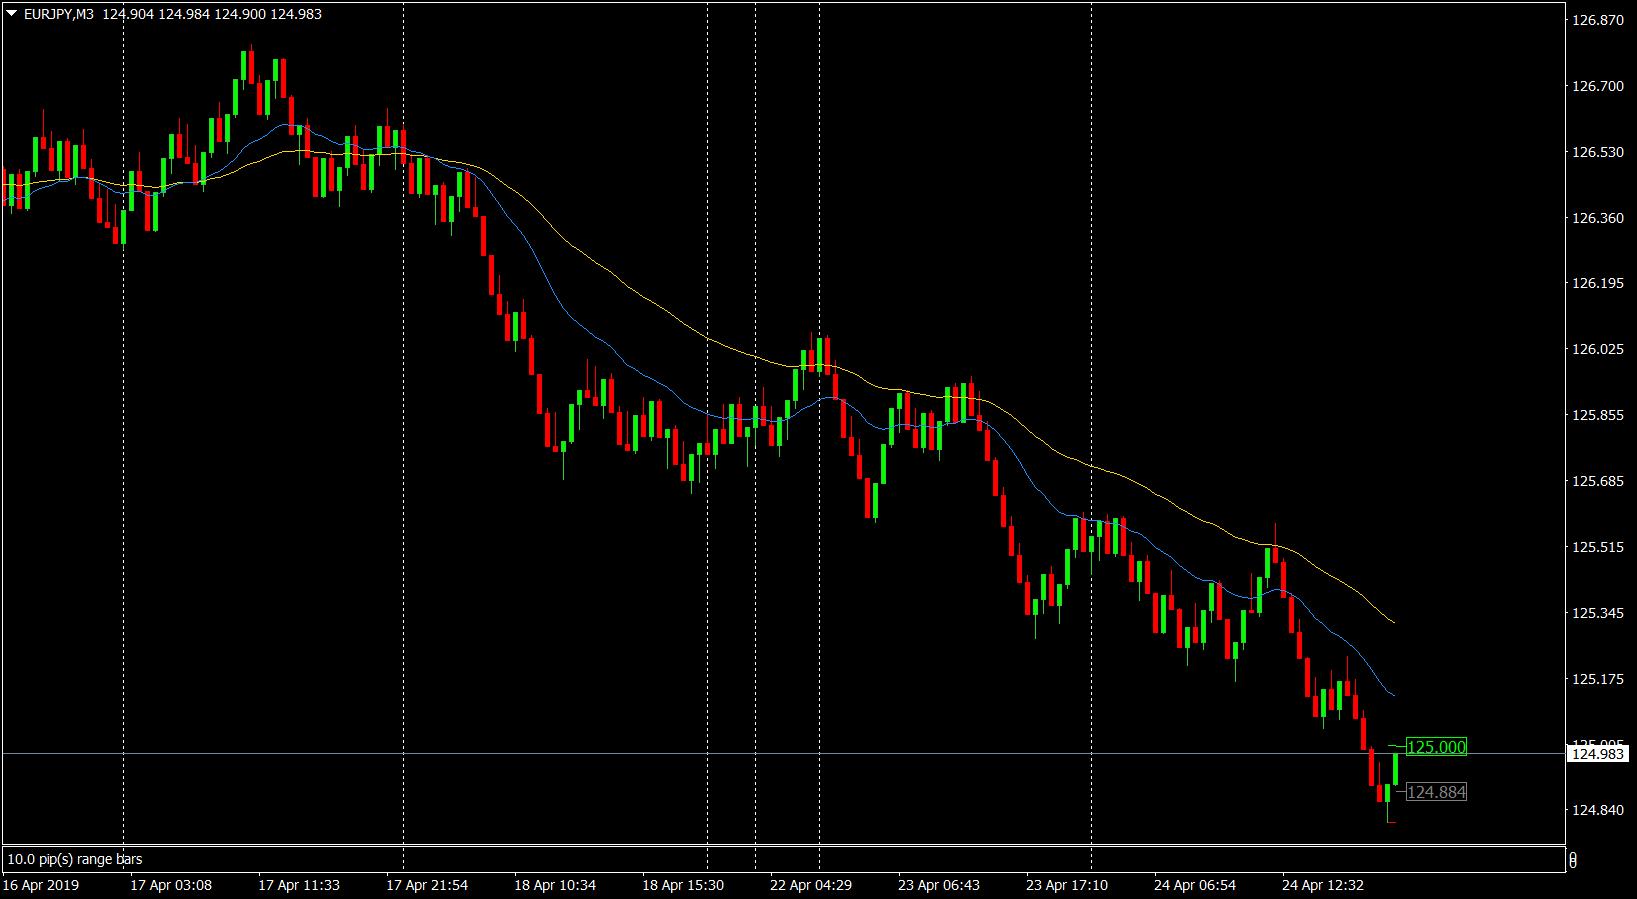 EURJPY range bar chart